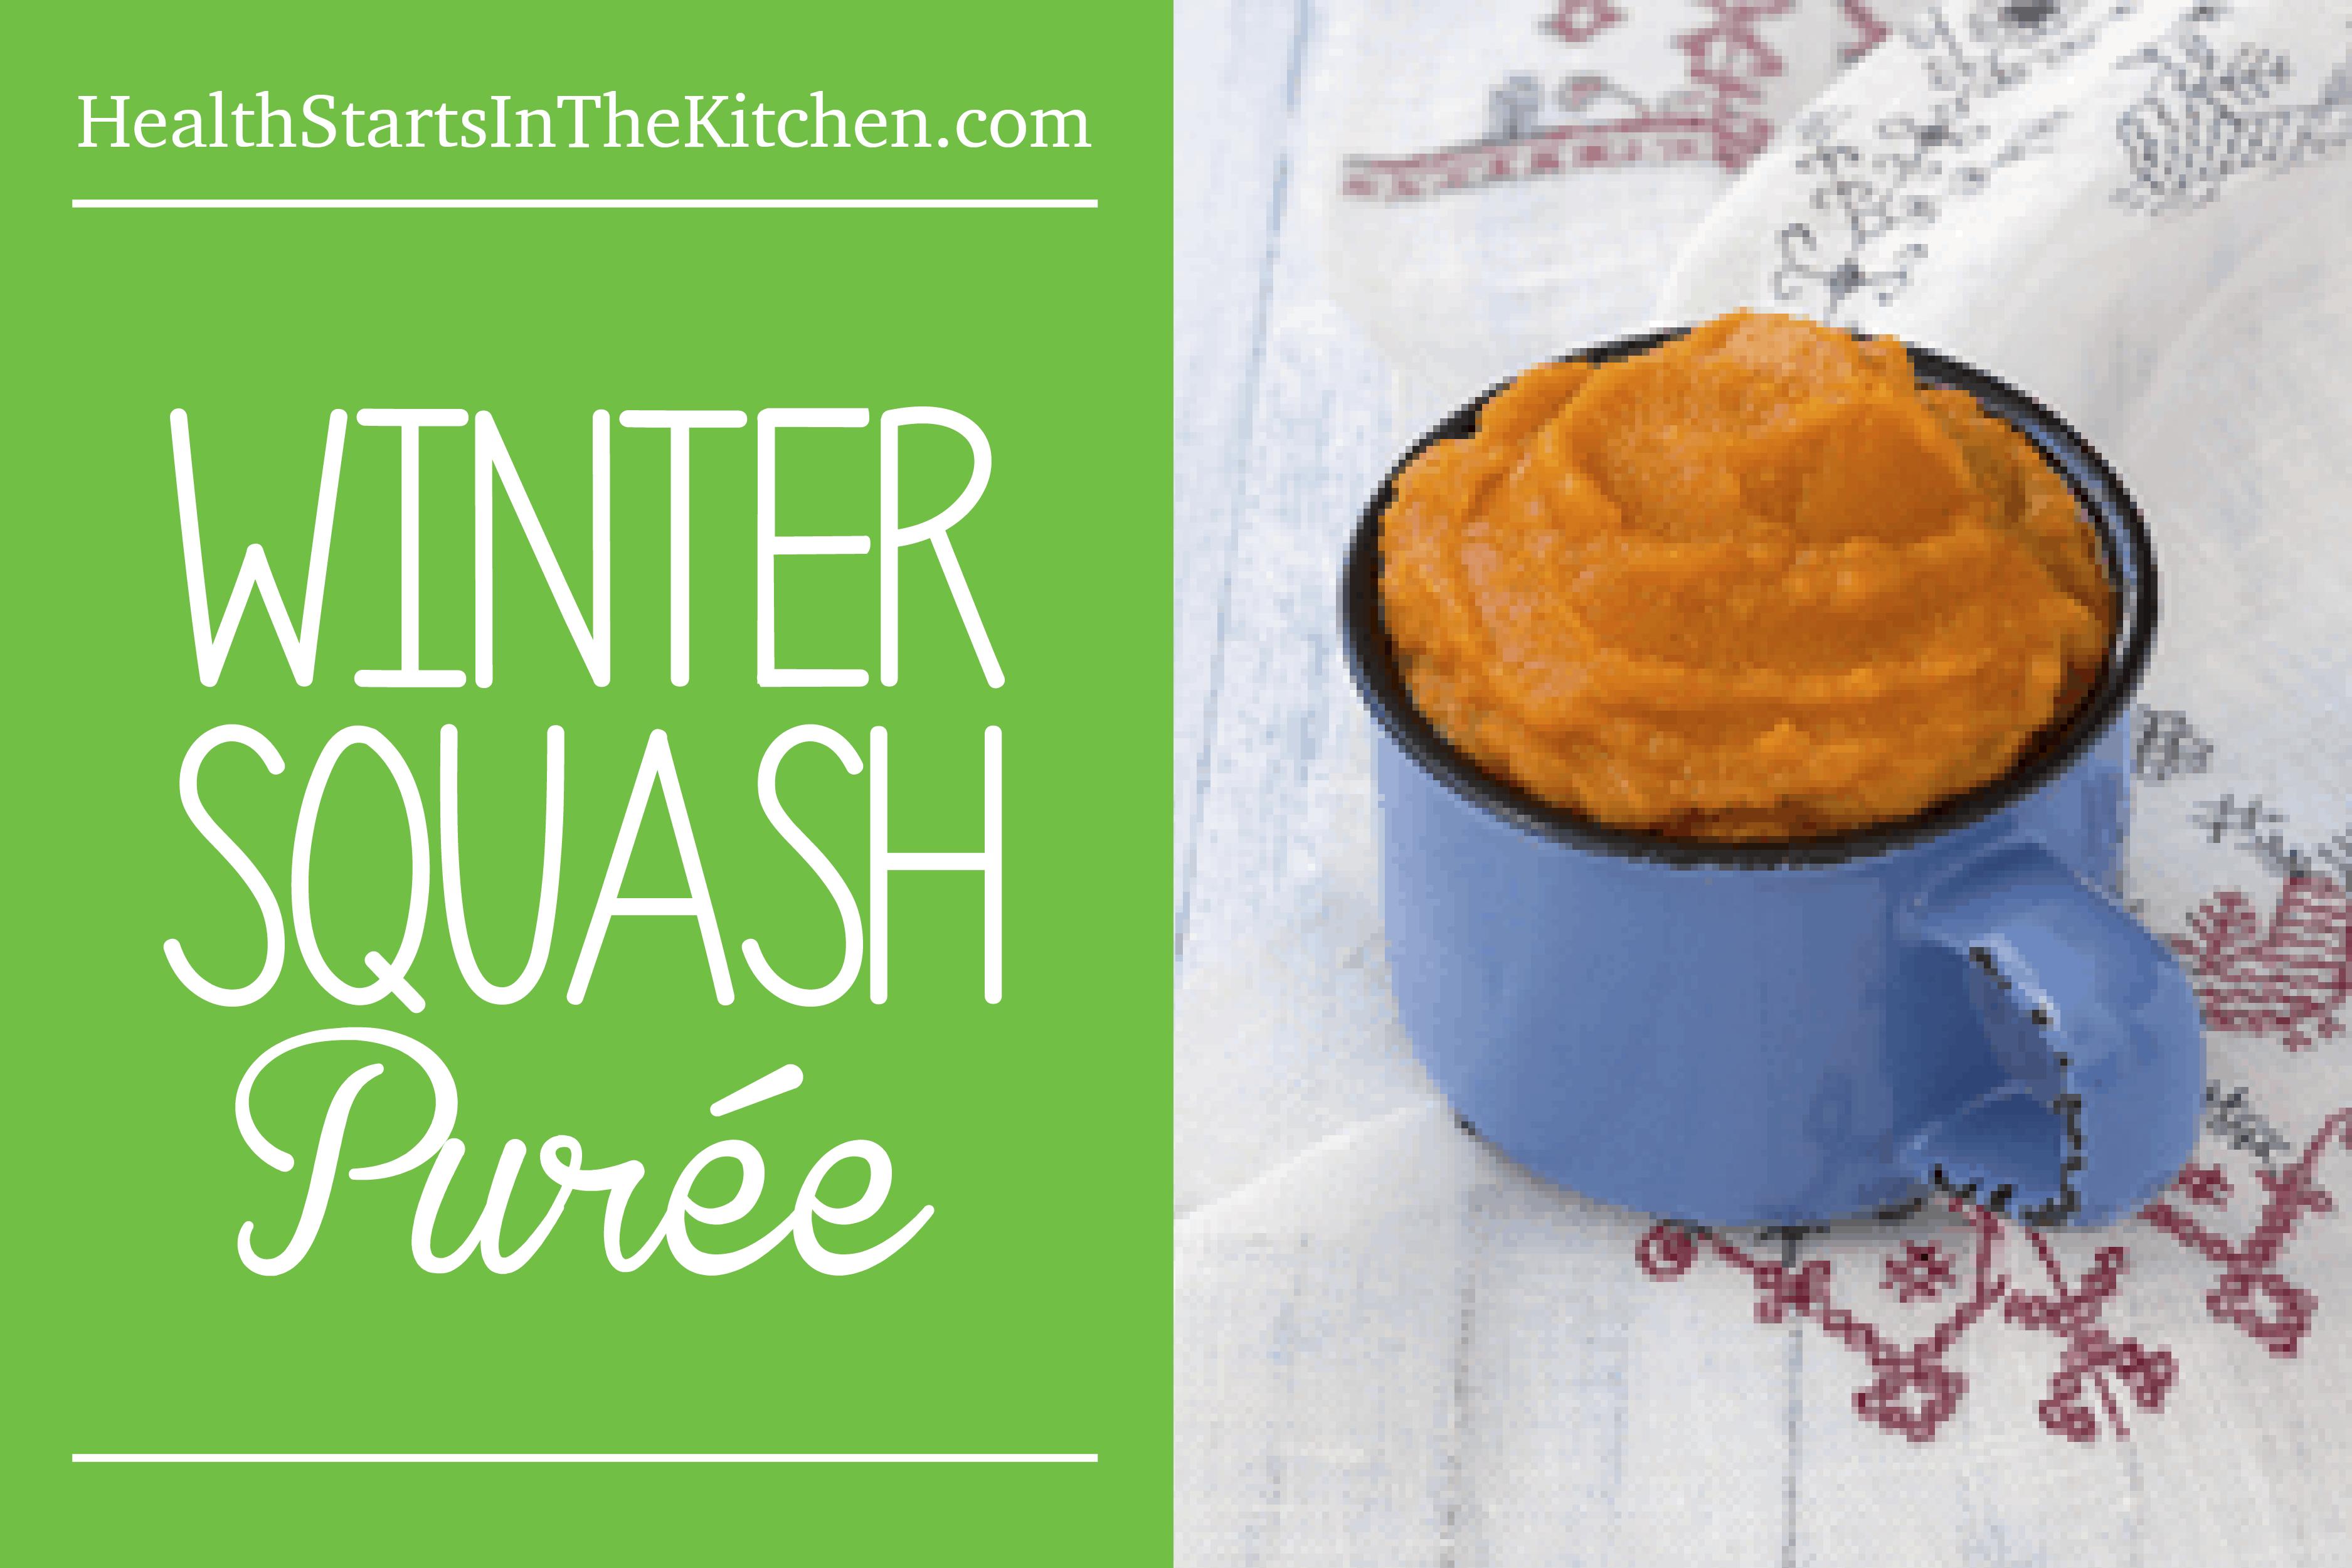 Winter Squash Puree